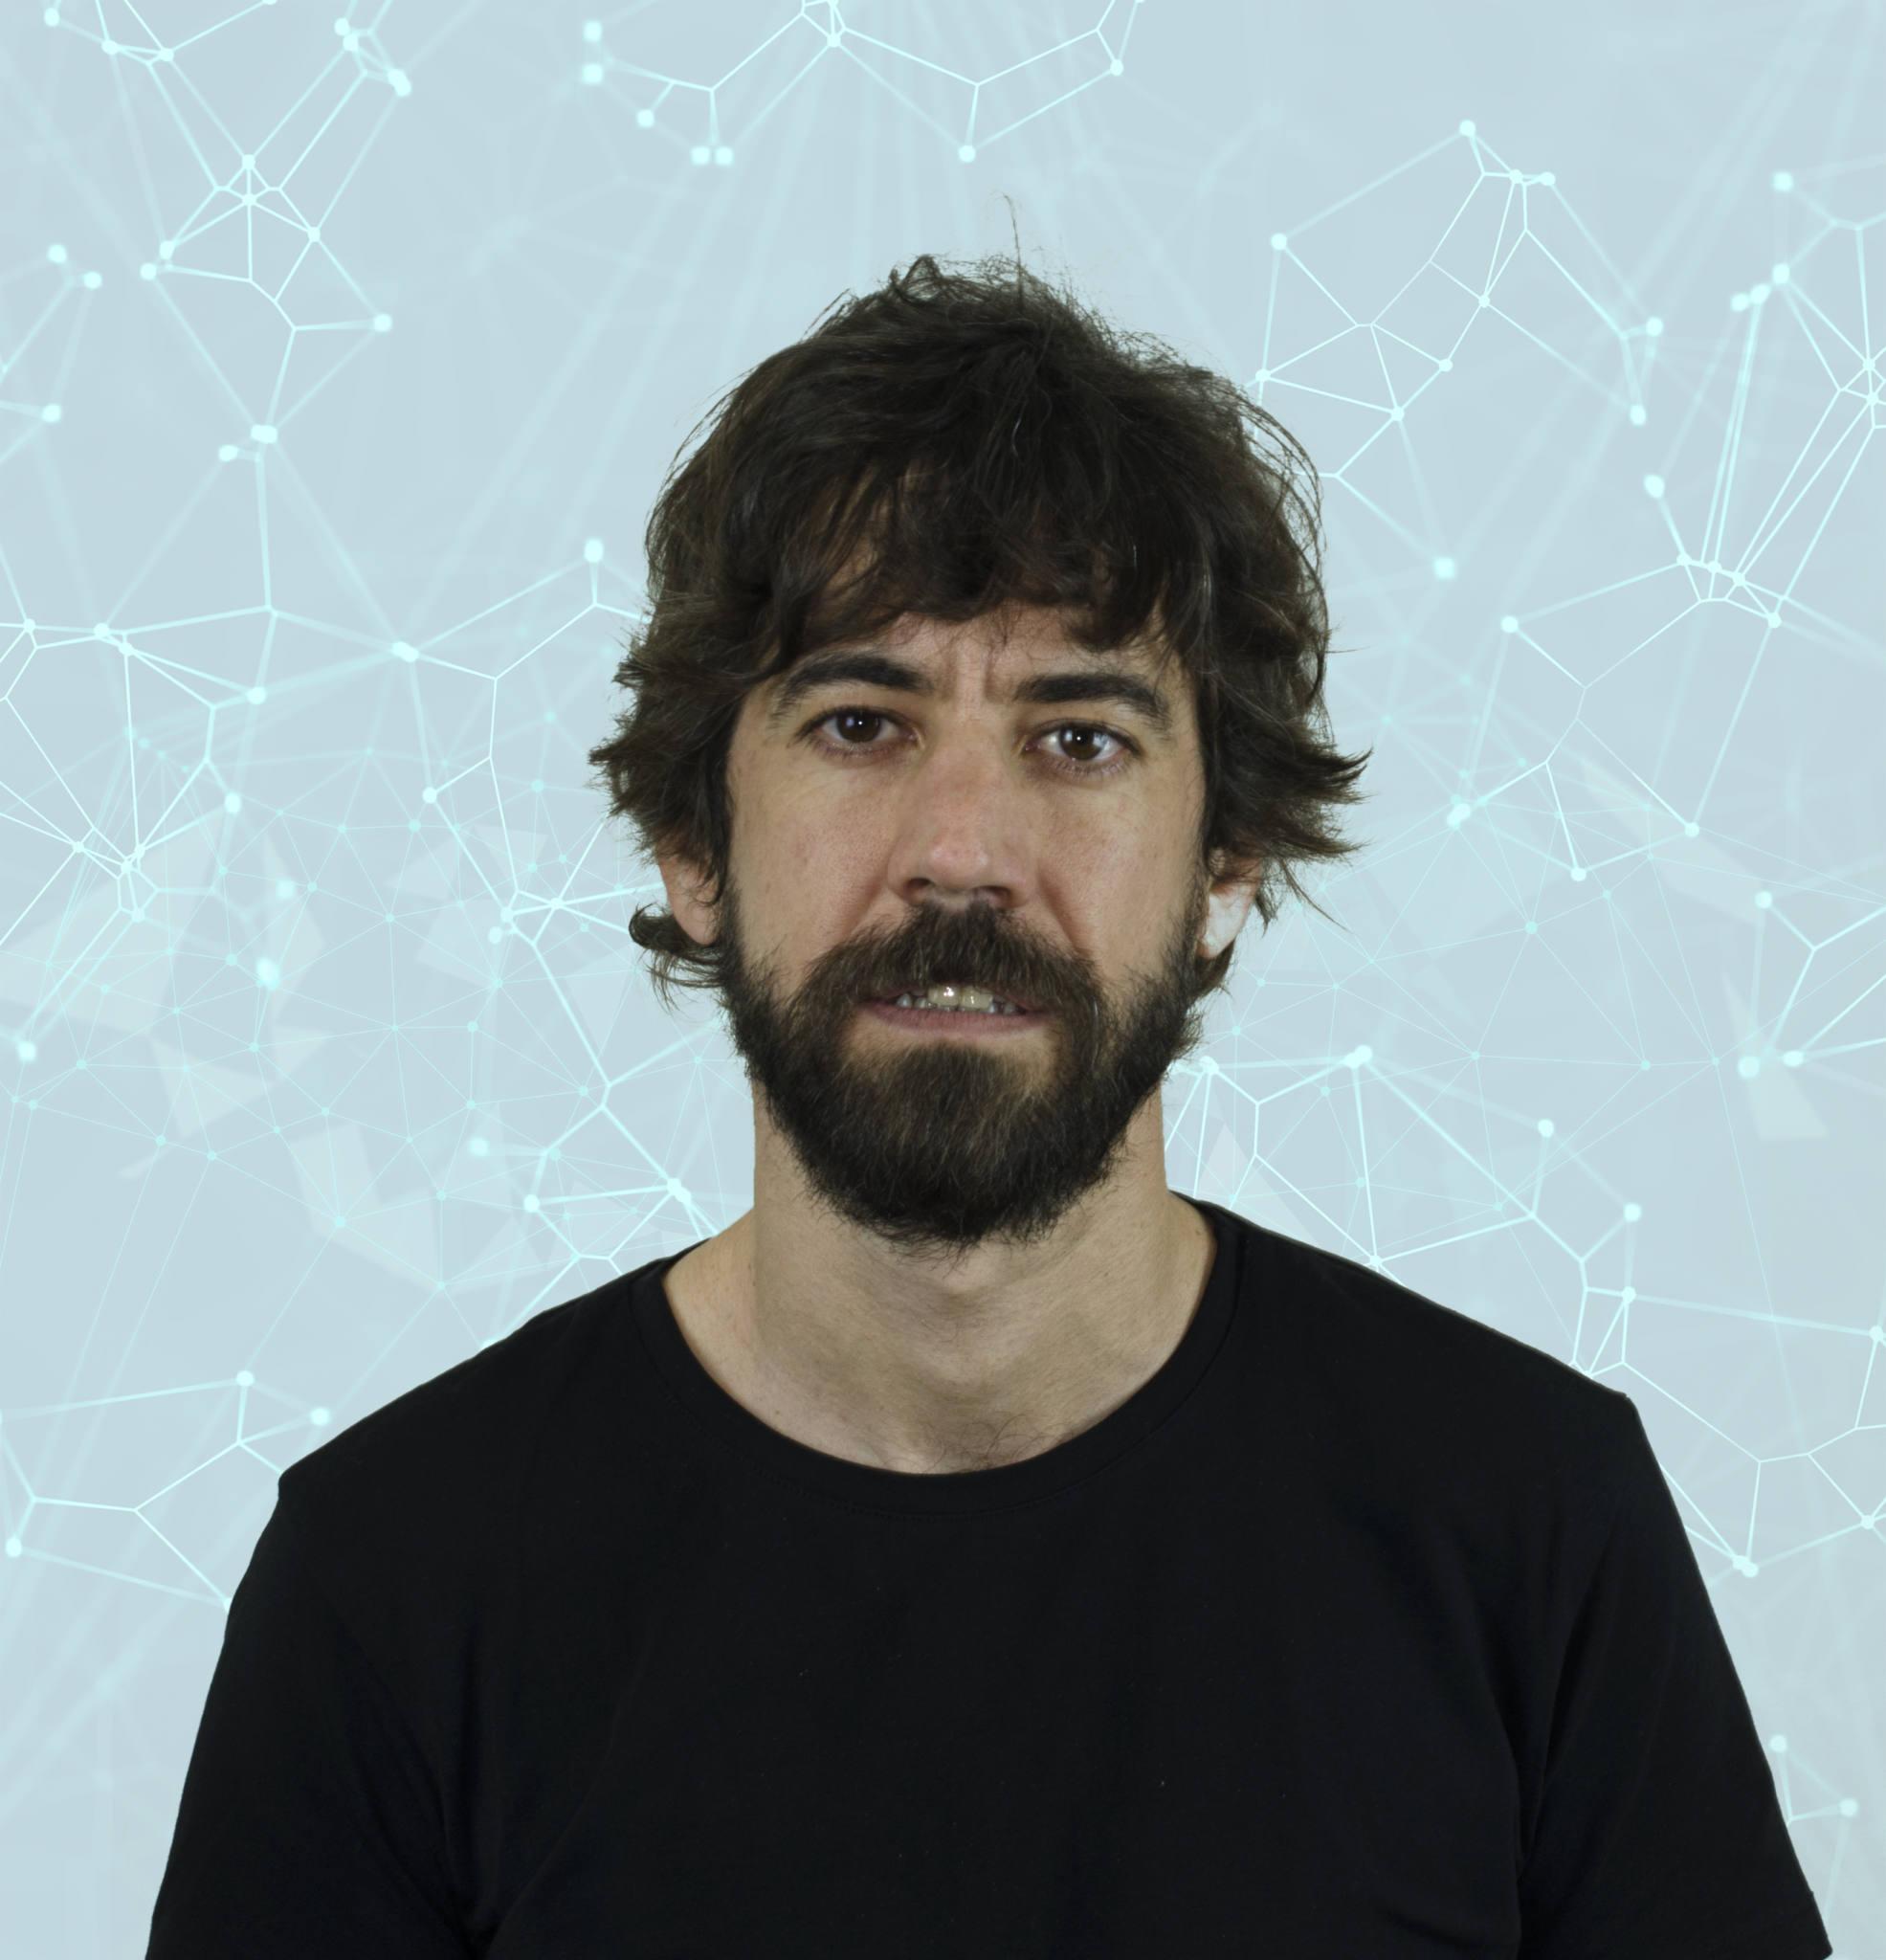 David del Prado